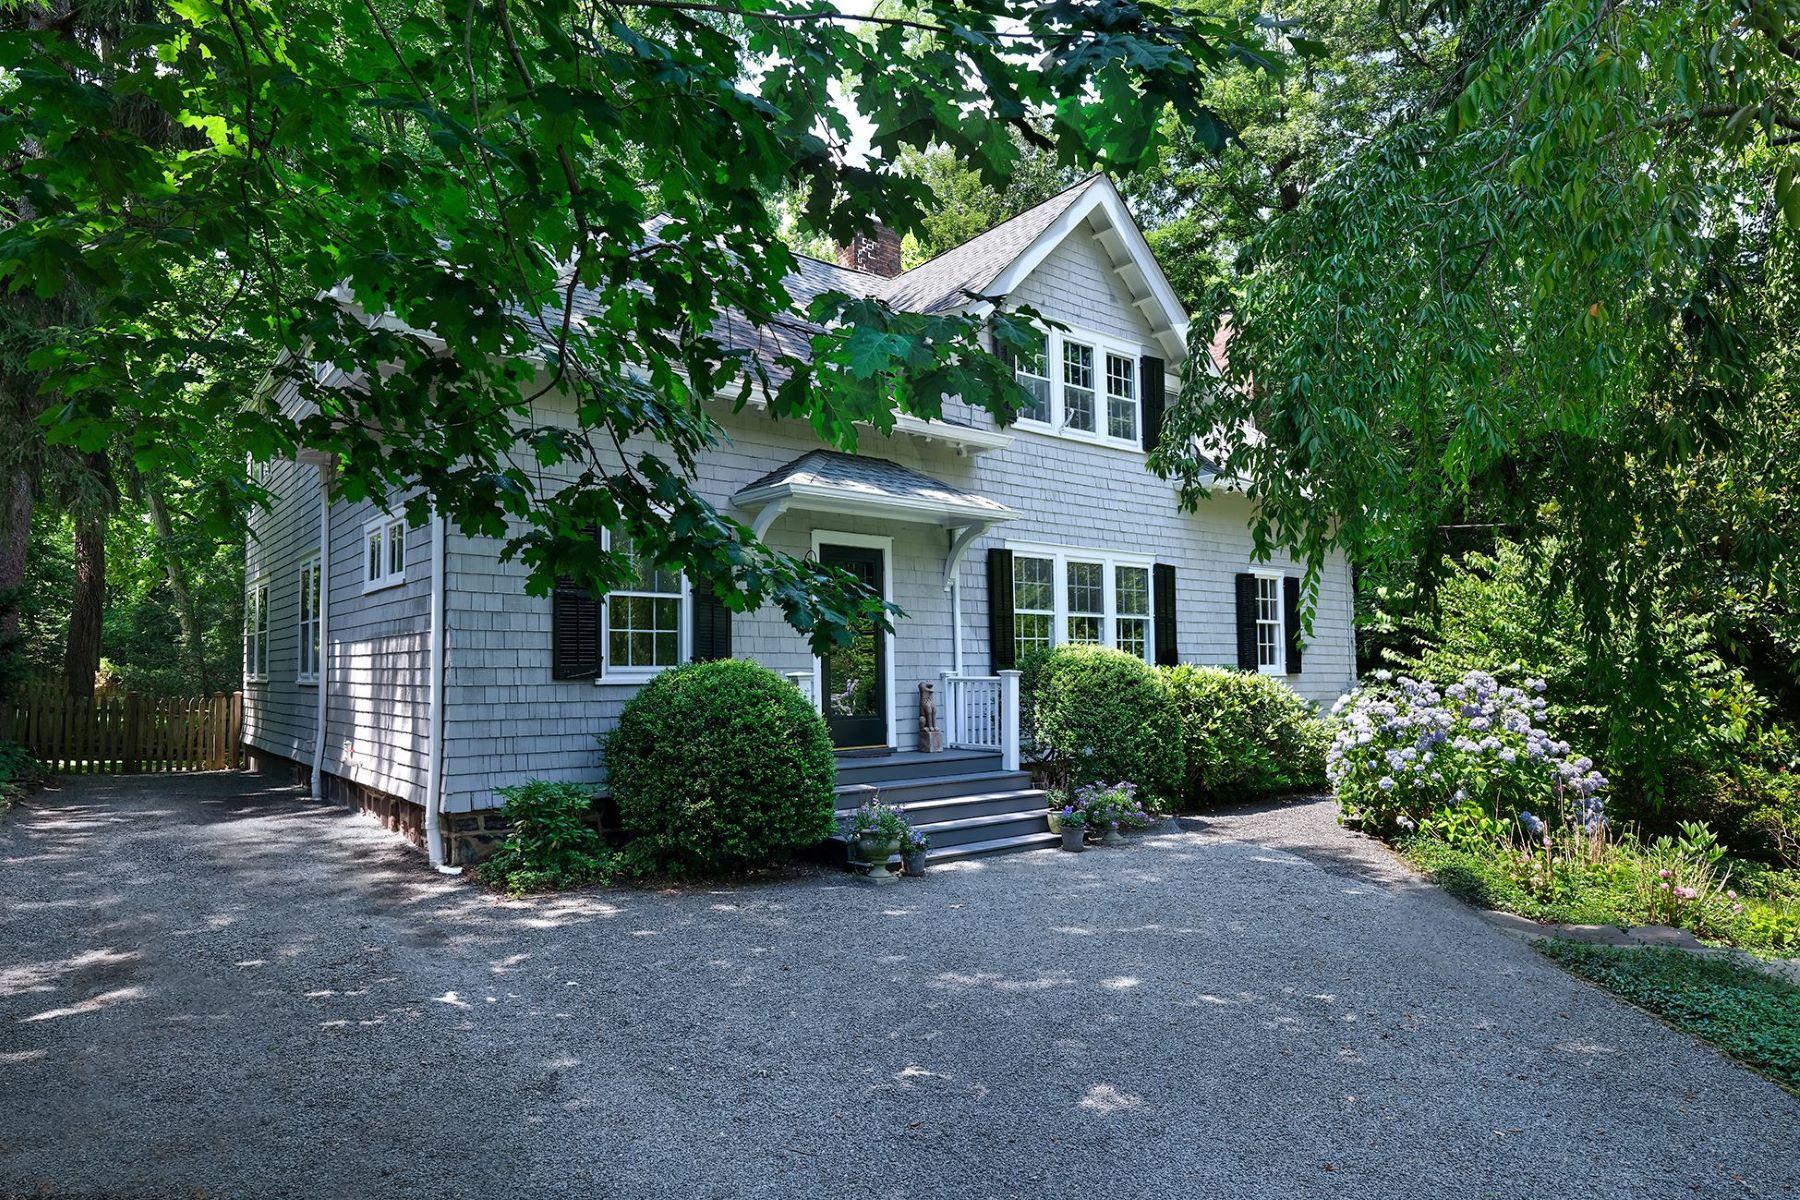 Single Family Homes για την Πώληση στο Chic and Shingled in the Western Section 104 Bayard Lane, Princeton, Νιου Τζερσεϋ 08540 Ηνωμένες Πολιτείες